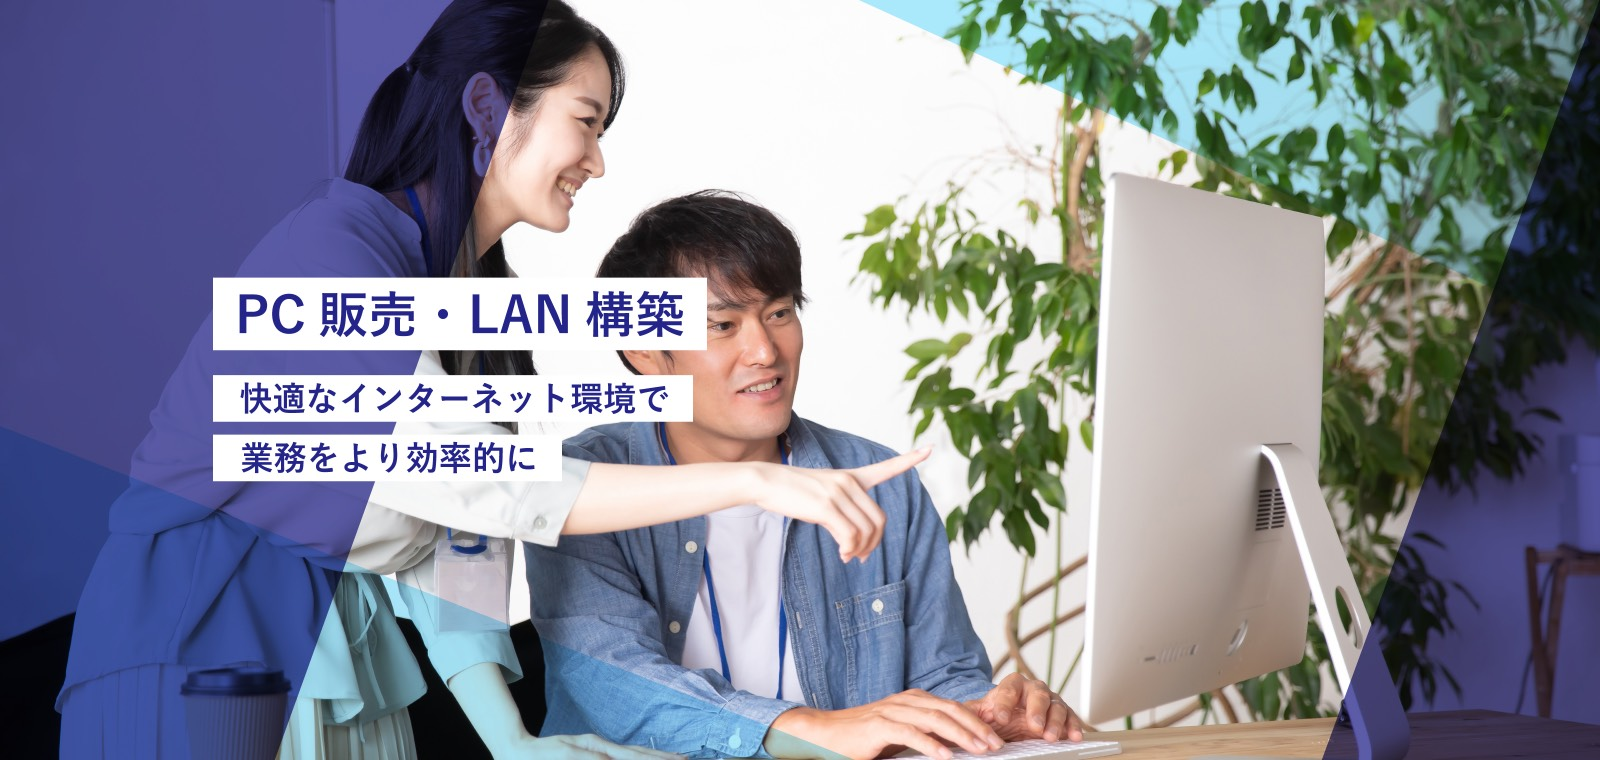 PC販売・LAN構築 快適なインターネット環境で業務をより効率的に